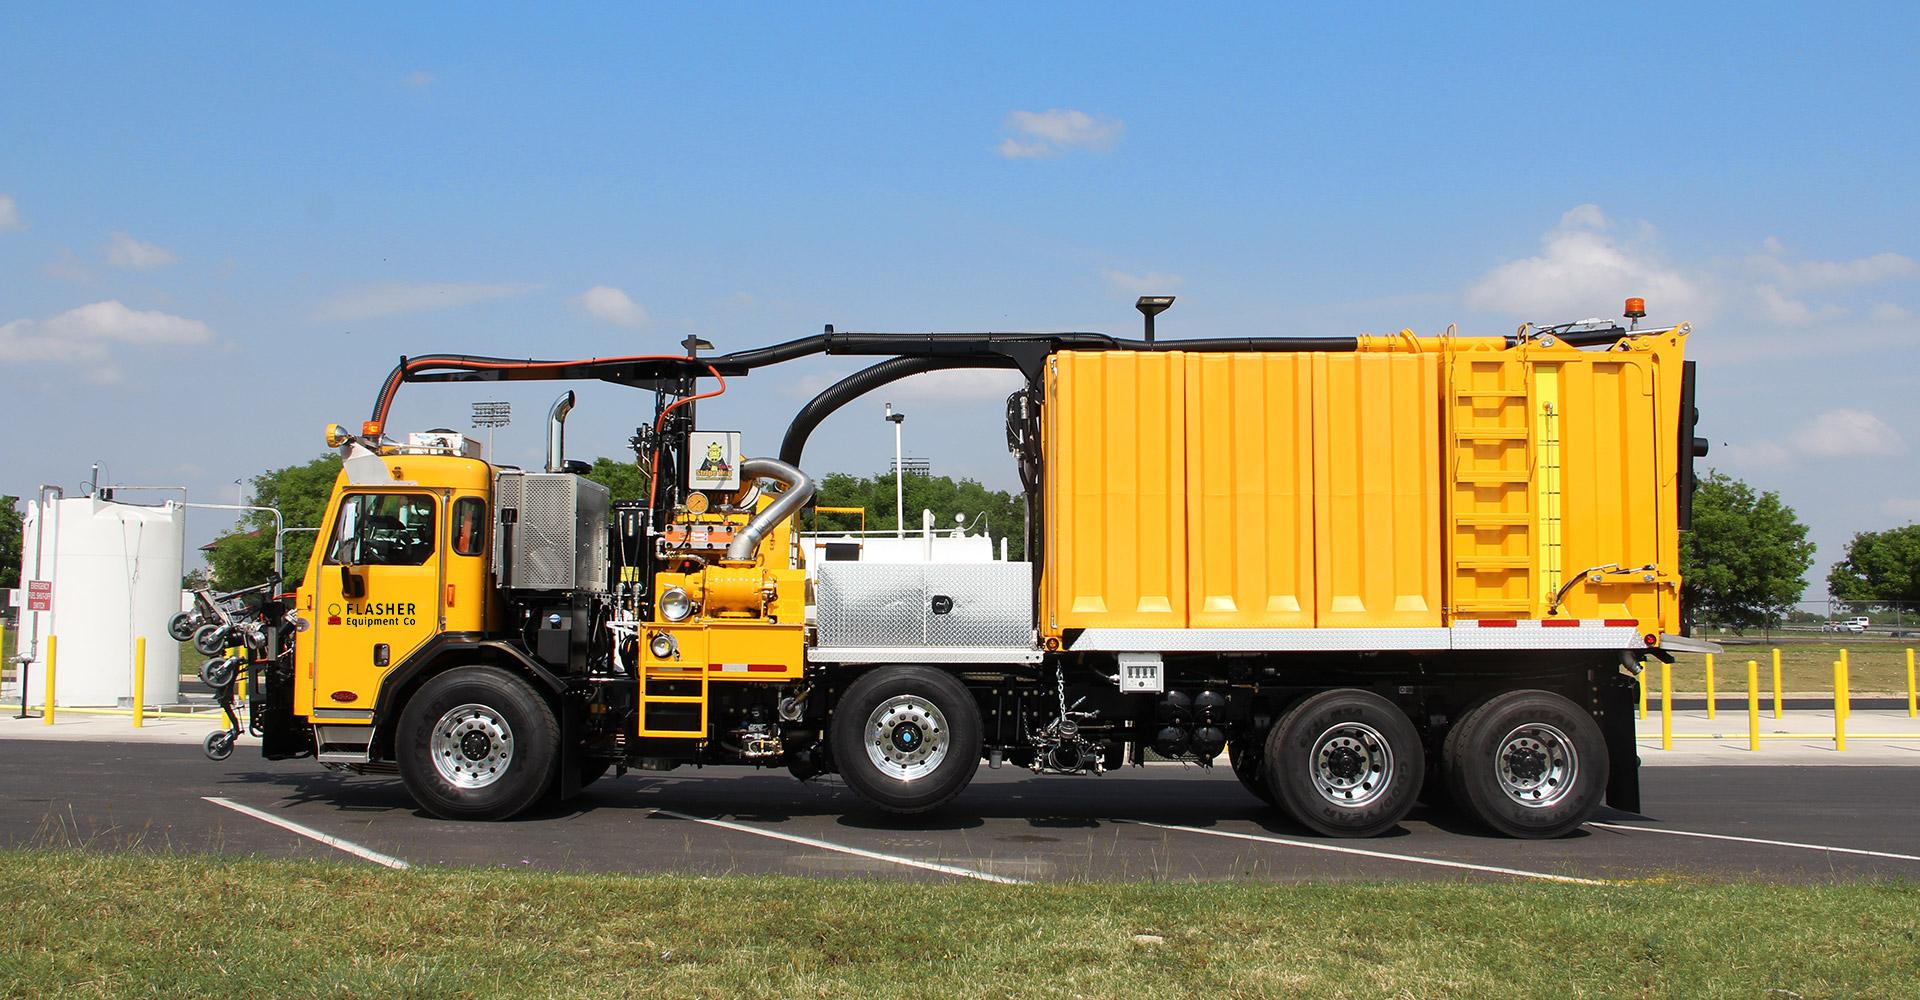 Flasher Equipment Company Water Blaster